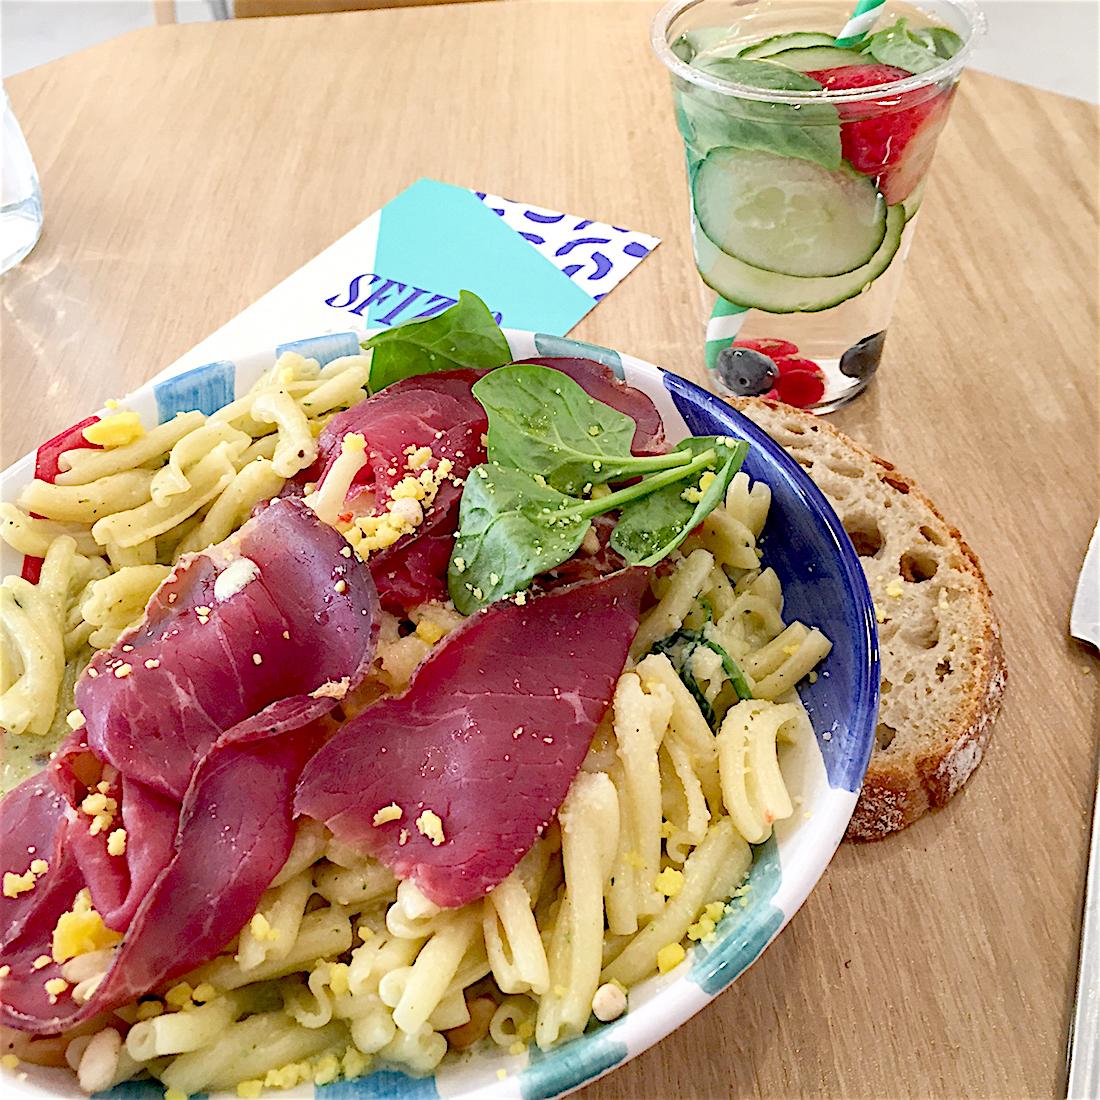 sfizio-montorgueil-paris-restaurant-paris